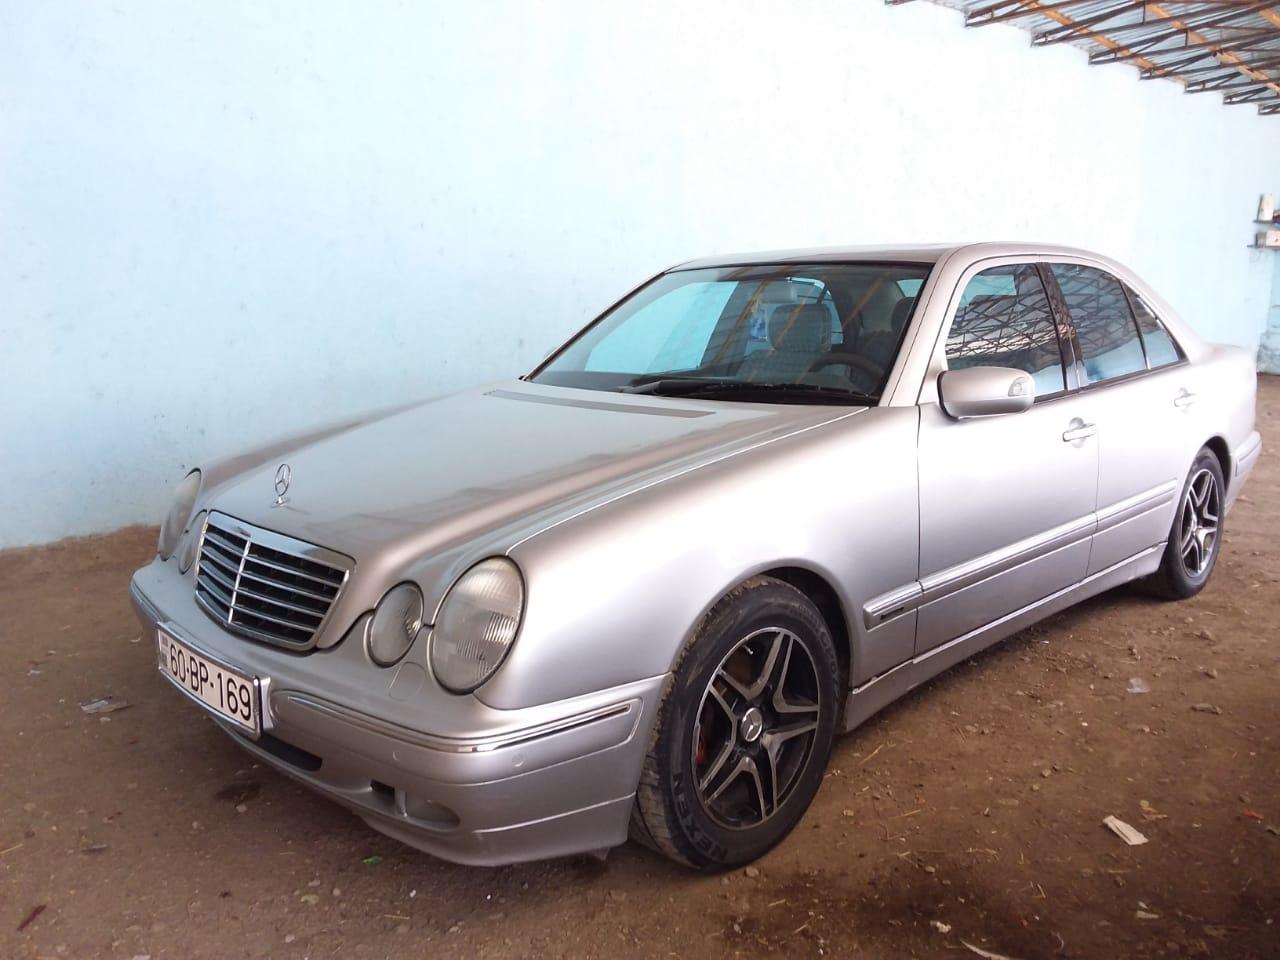 Mercedes-Benz E 240 2.4(lt) 1999 Подержанный  $8800